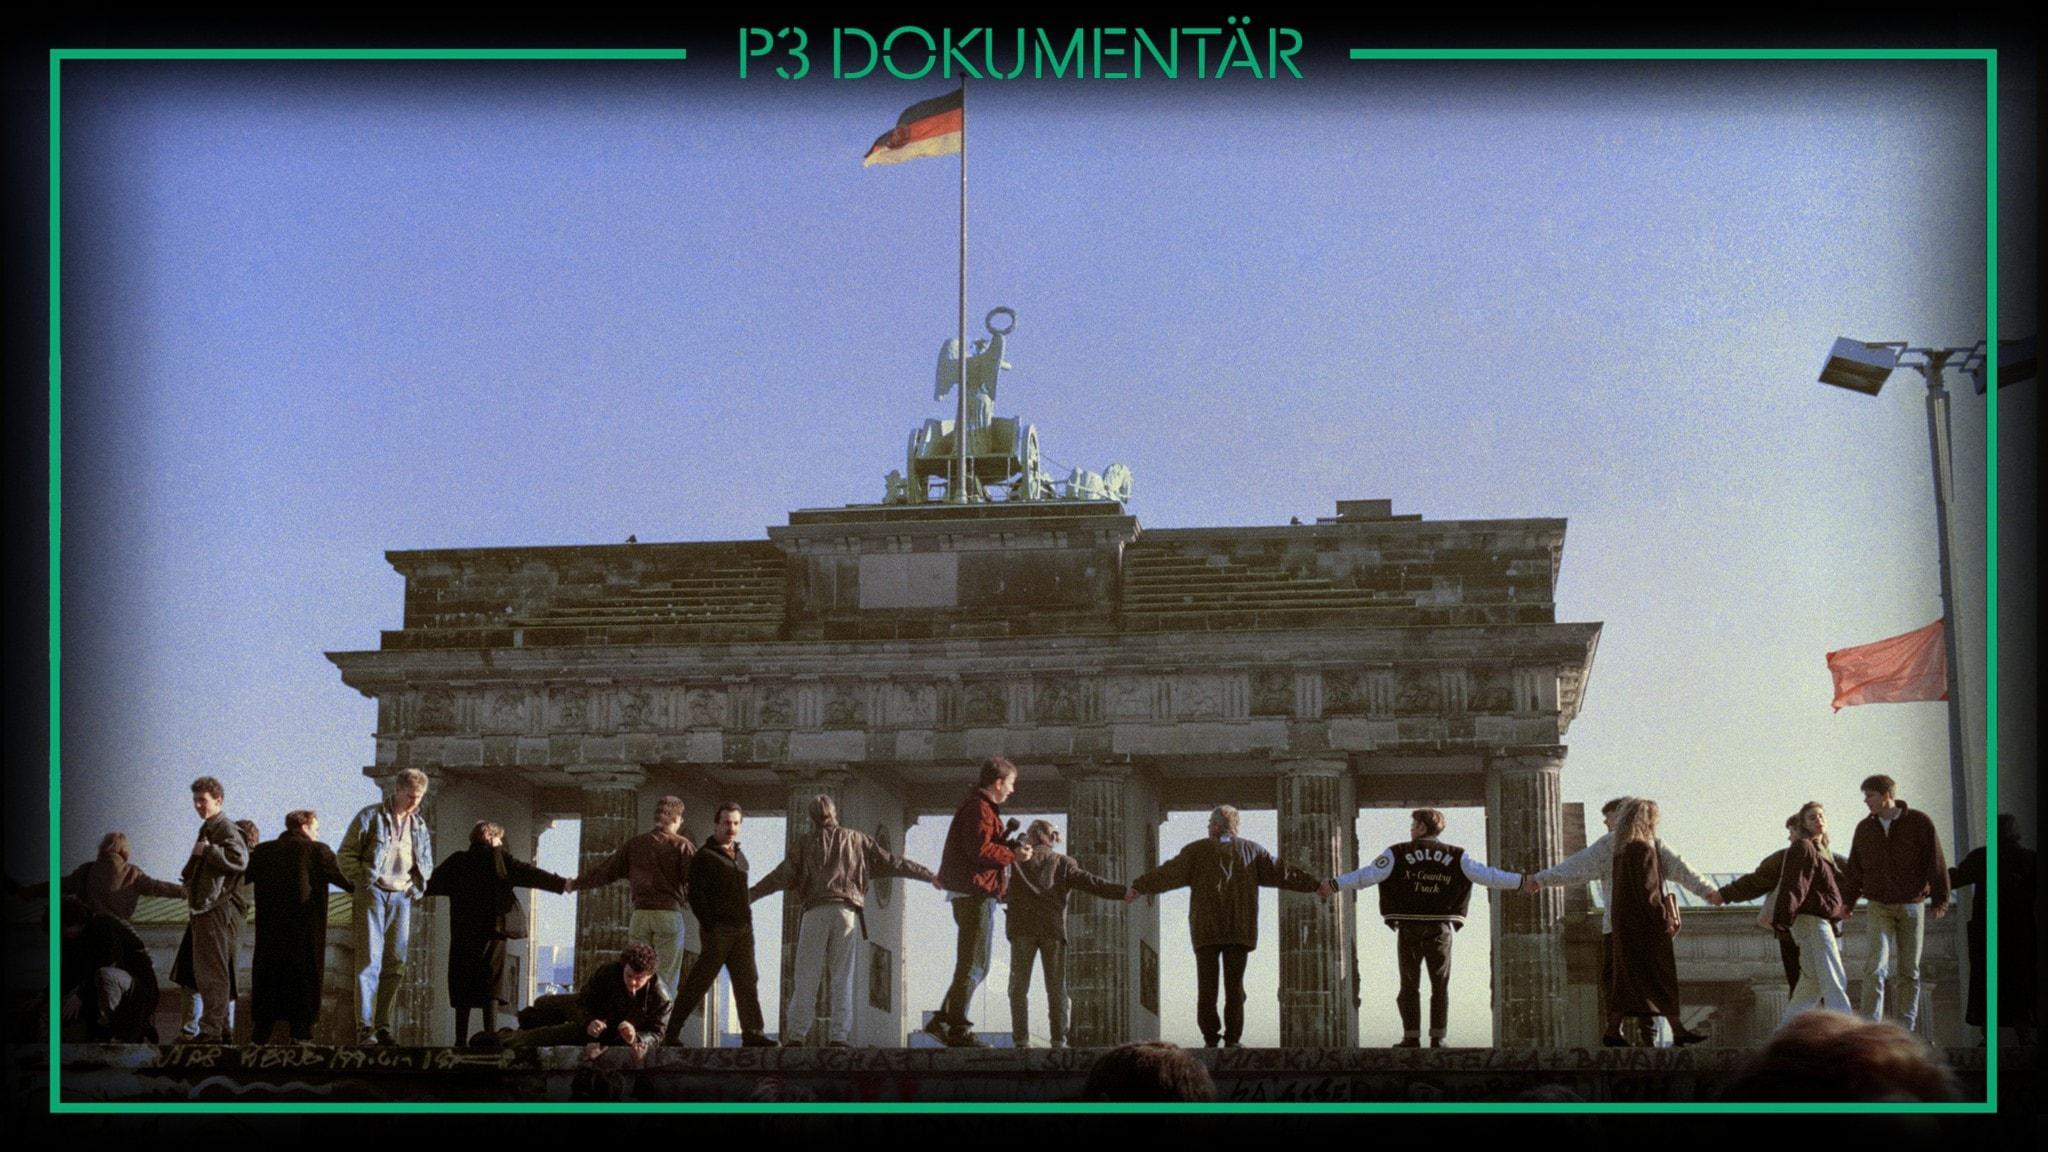 November 1989 - folket firar Berlinmurens fall.